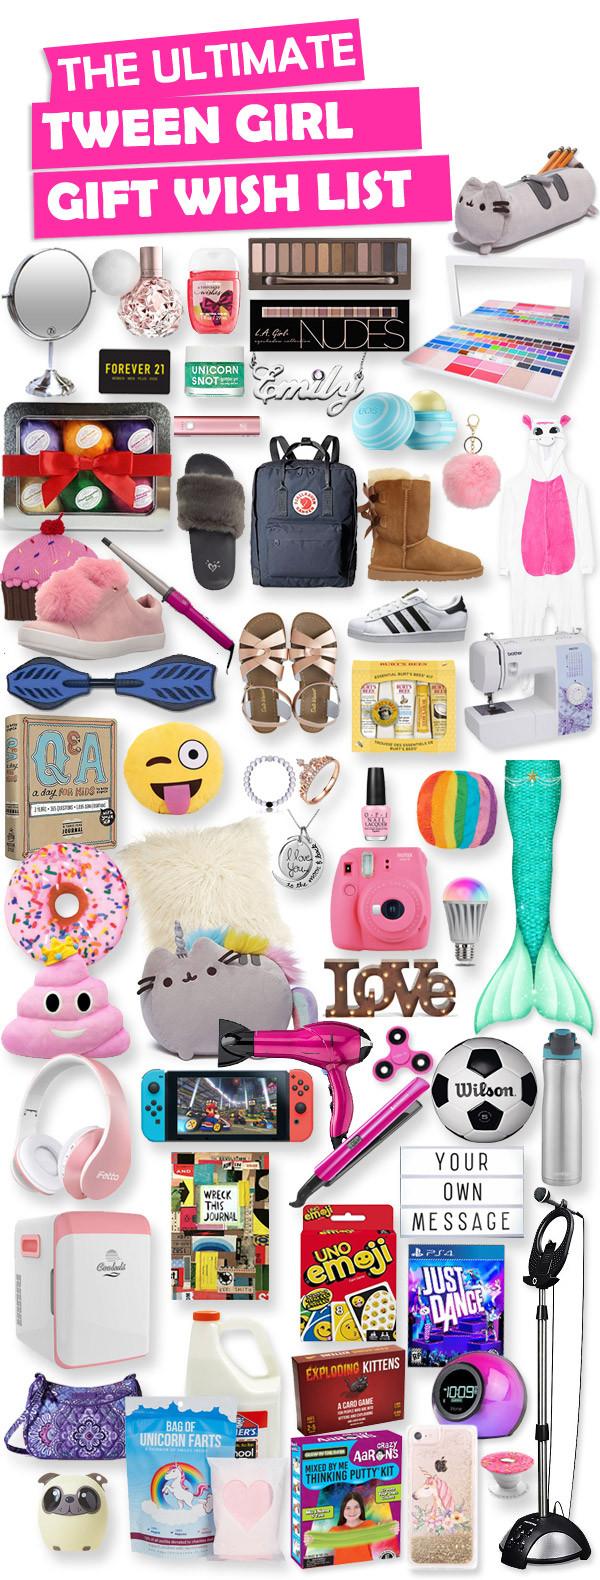 Gift Ideas For Tween Girls  Gifts For Tween Girls